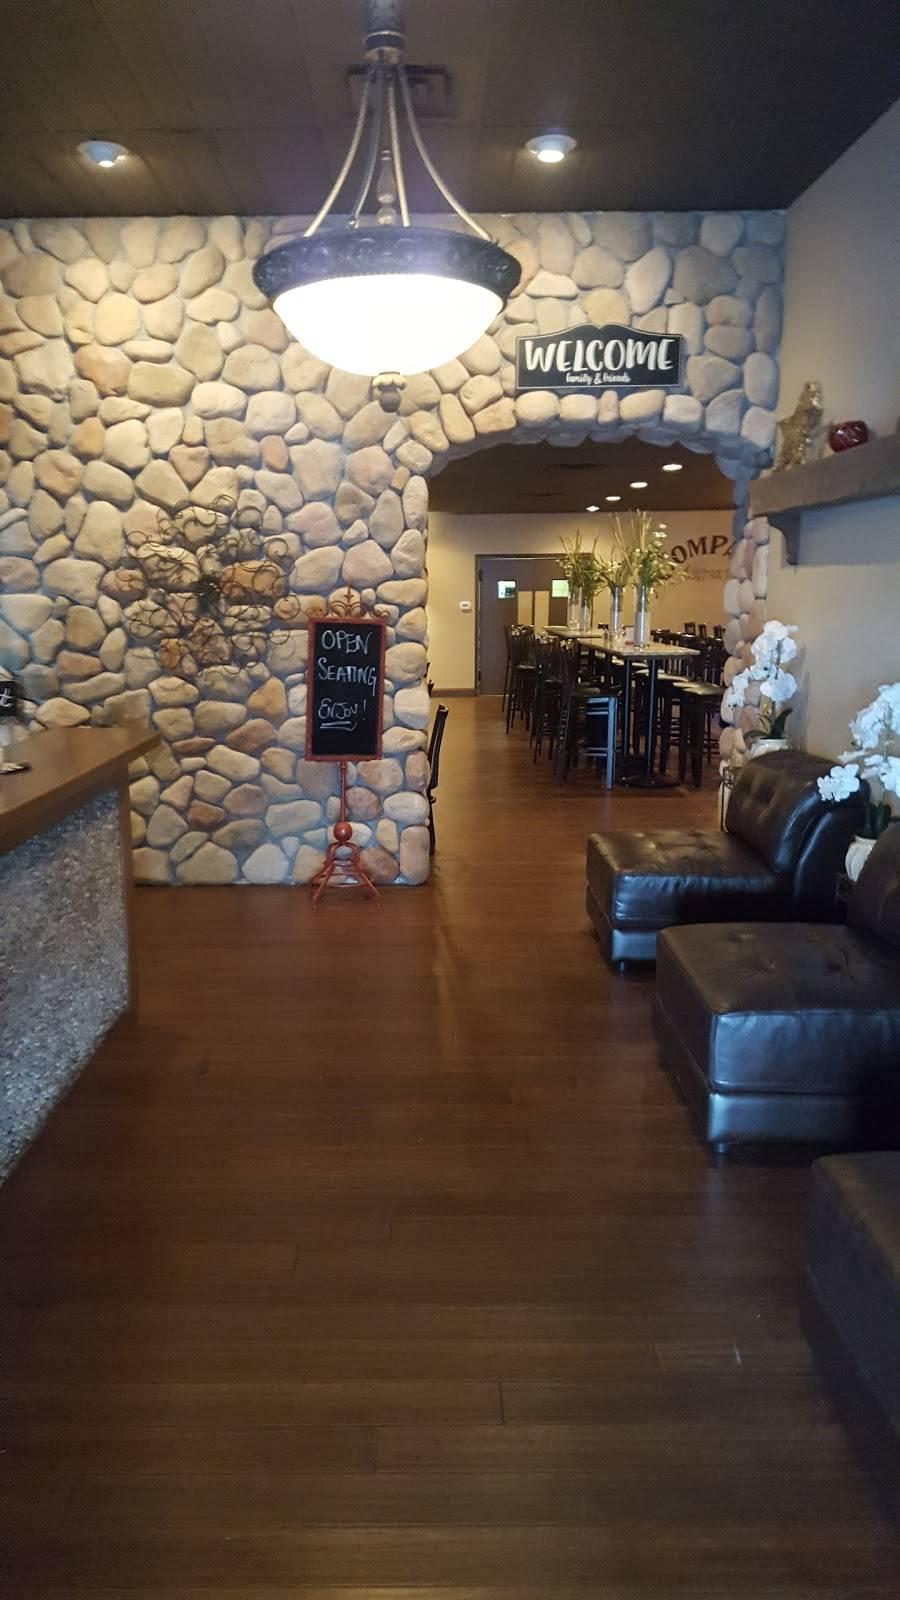 Comparis Banquet Facility | restaurant | 1333 Boston Rd, Springfield, MA 01119, USA | 4137829968 OR +1 413-782-9968